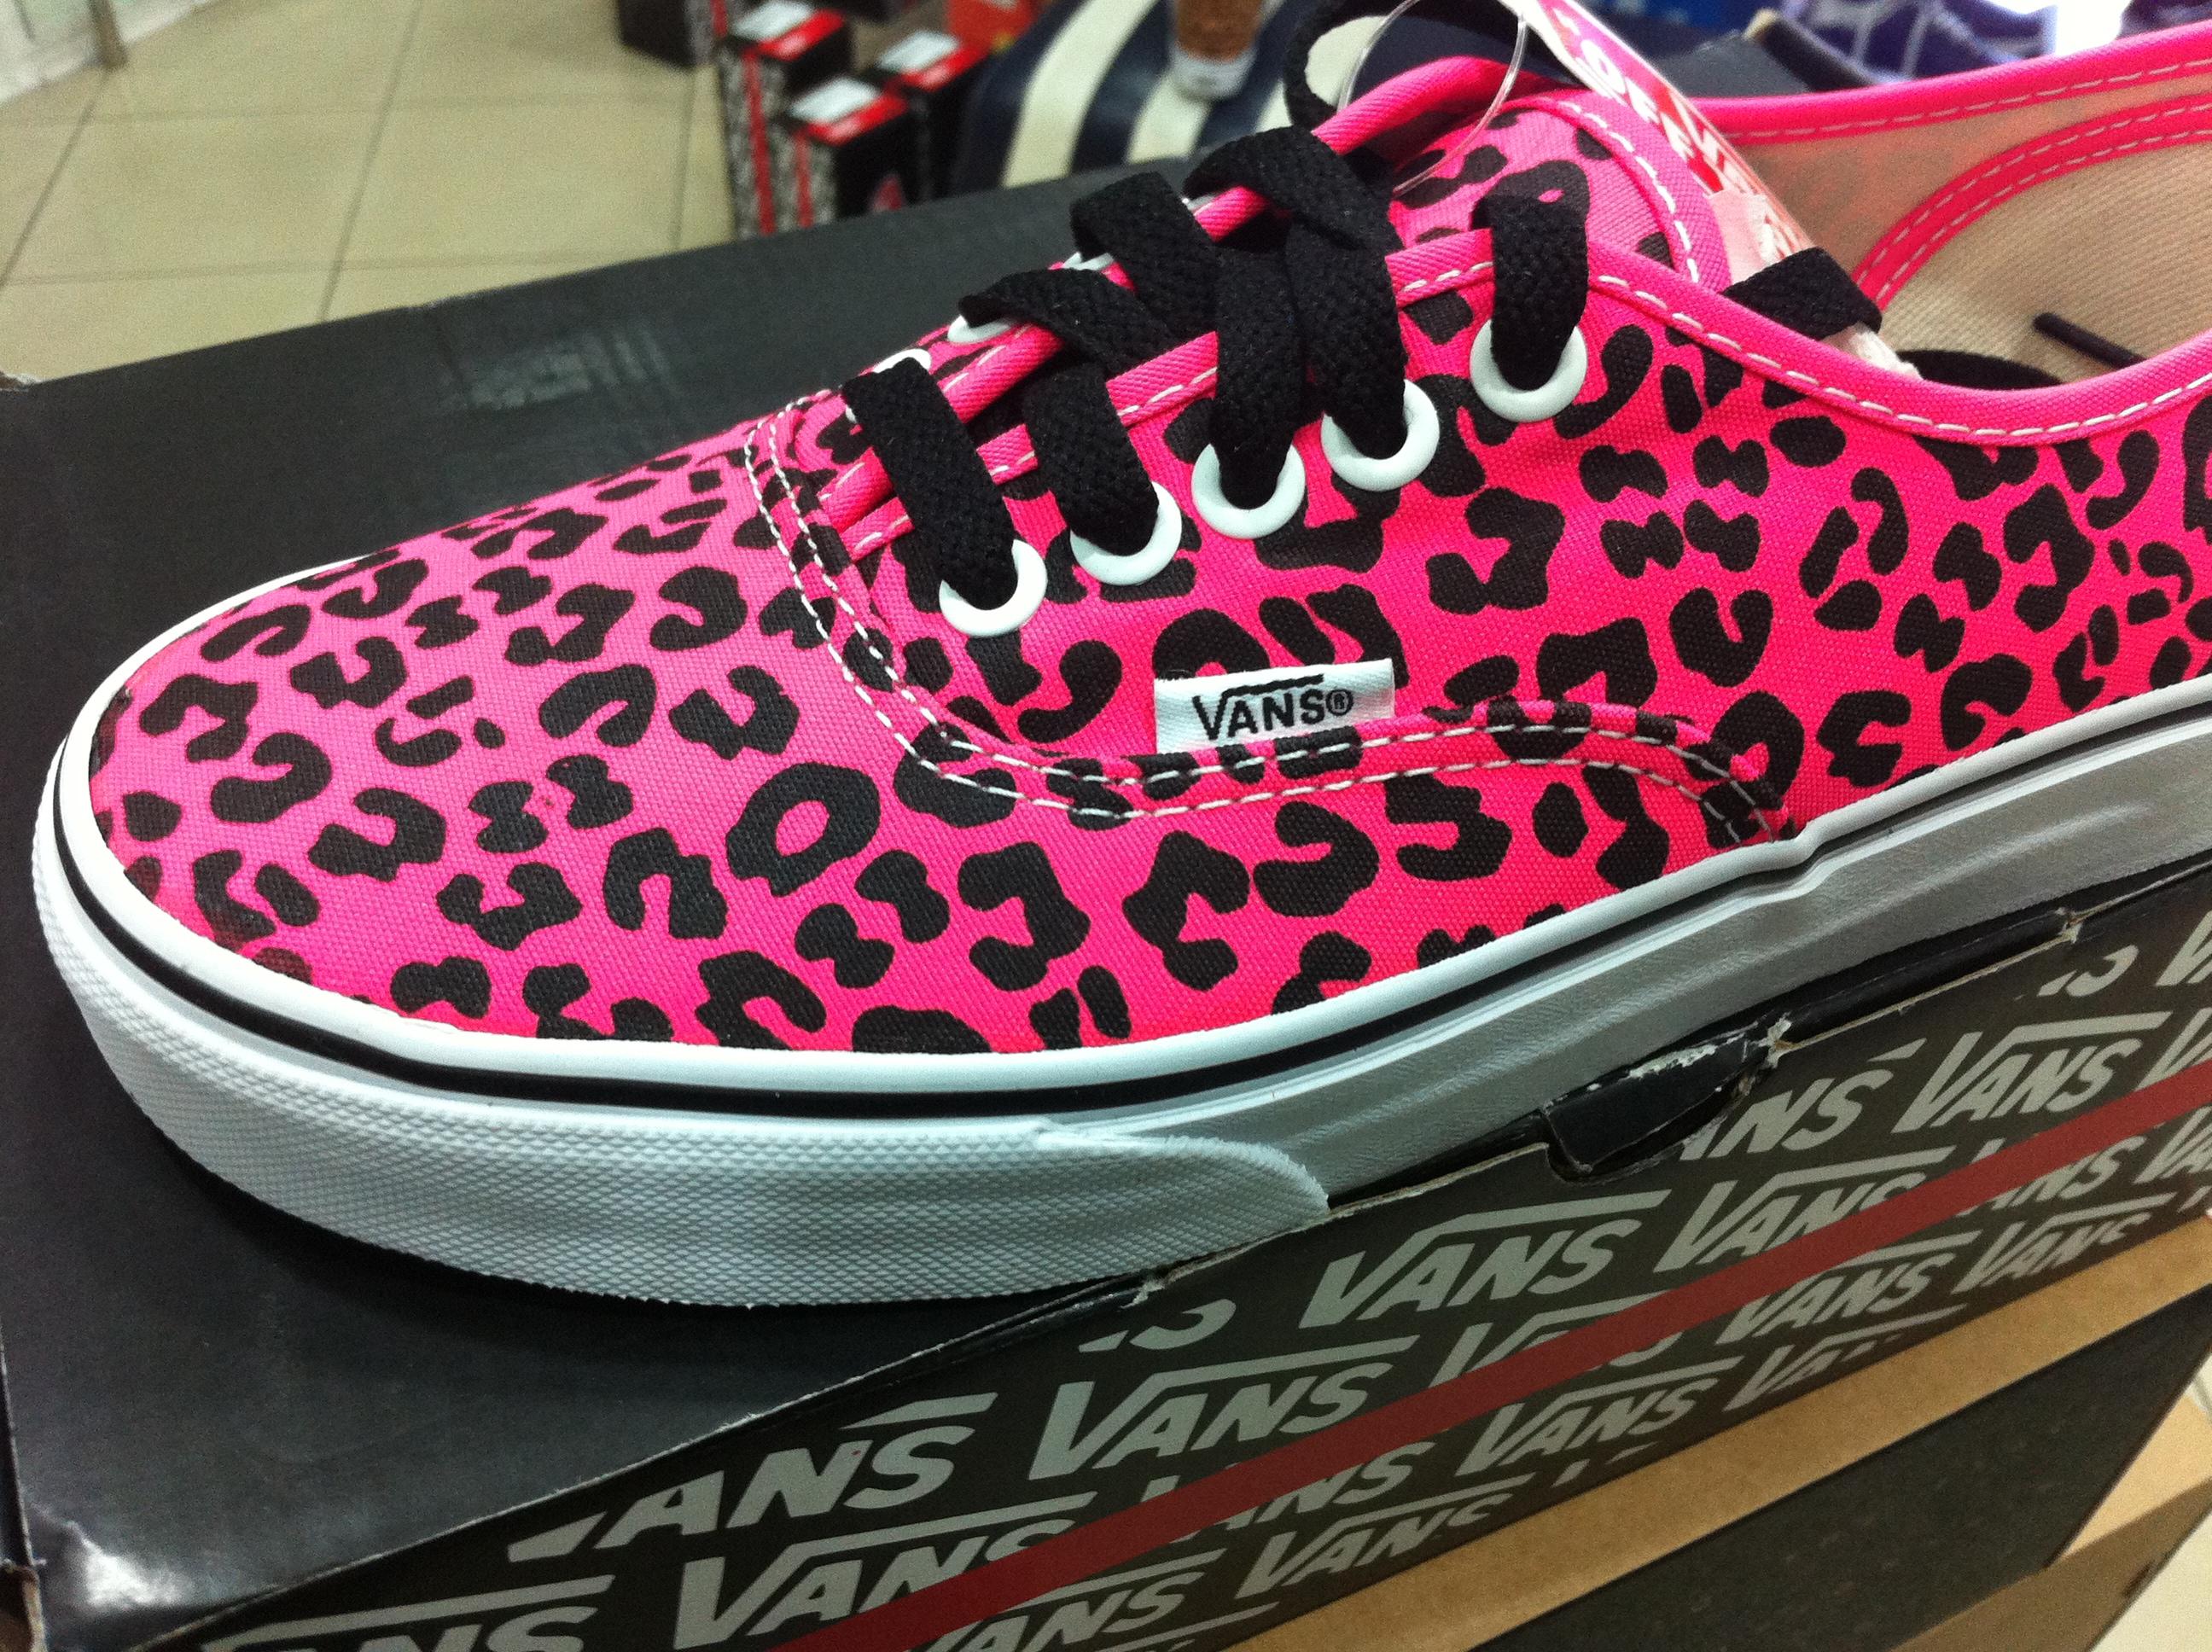 5a9db8b5f2 Scarpe Vans Leopardate Neon Rosa   Pink - Shopping Sport Scarpe